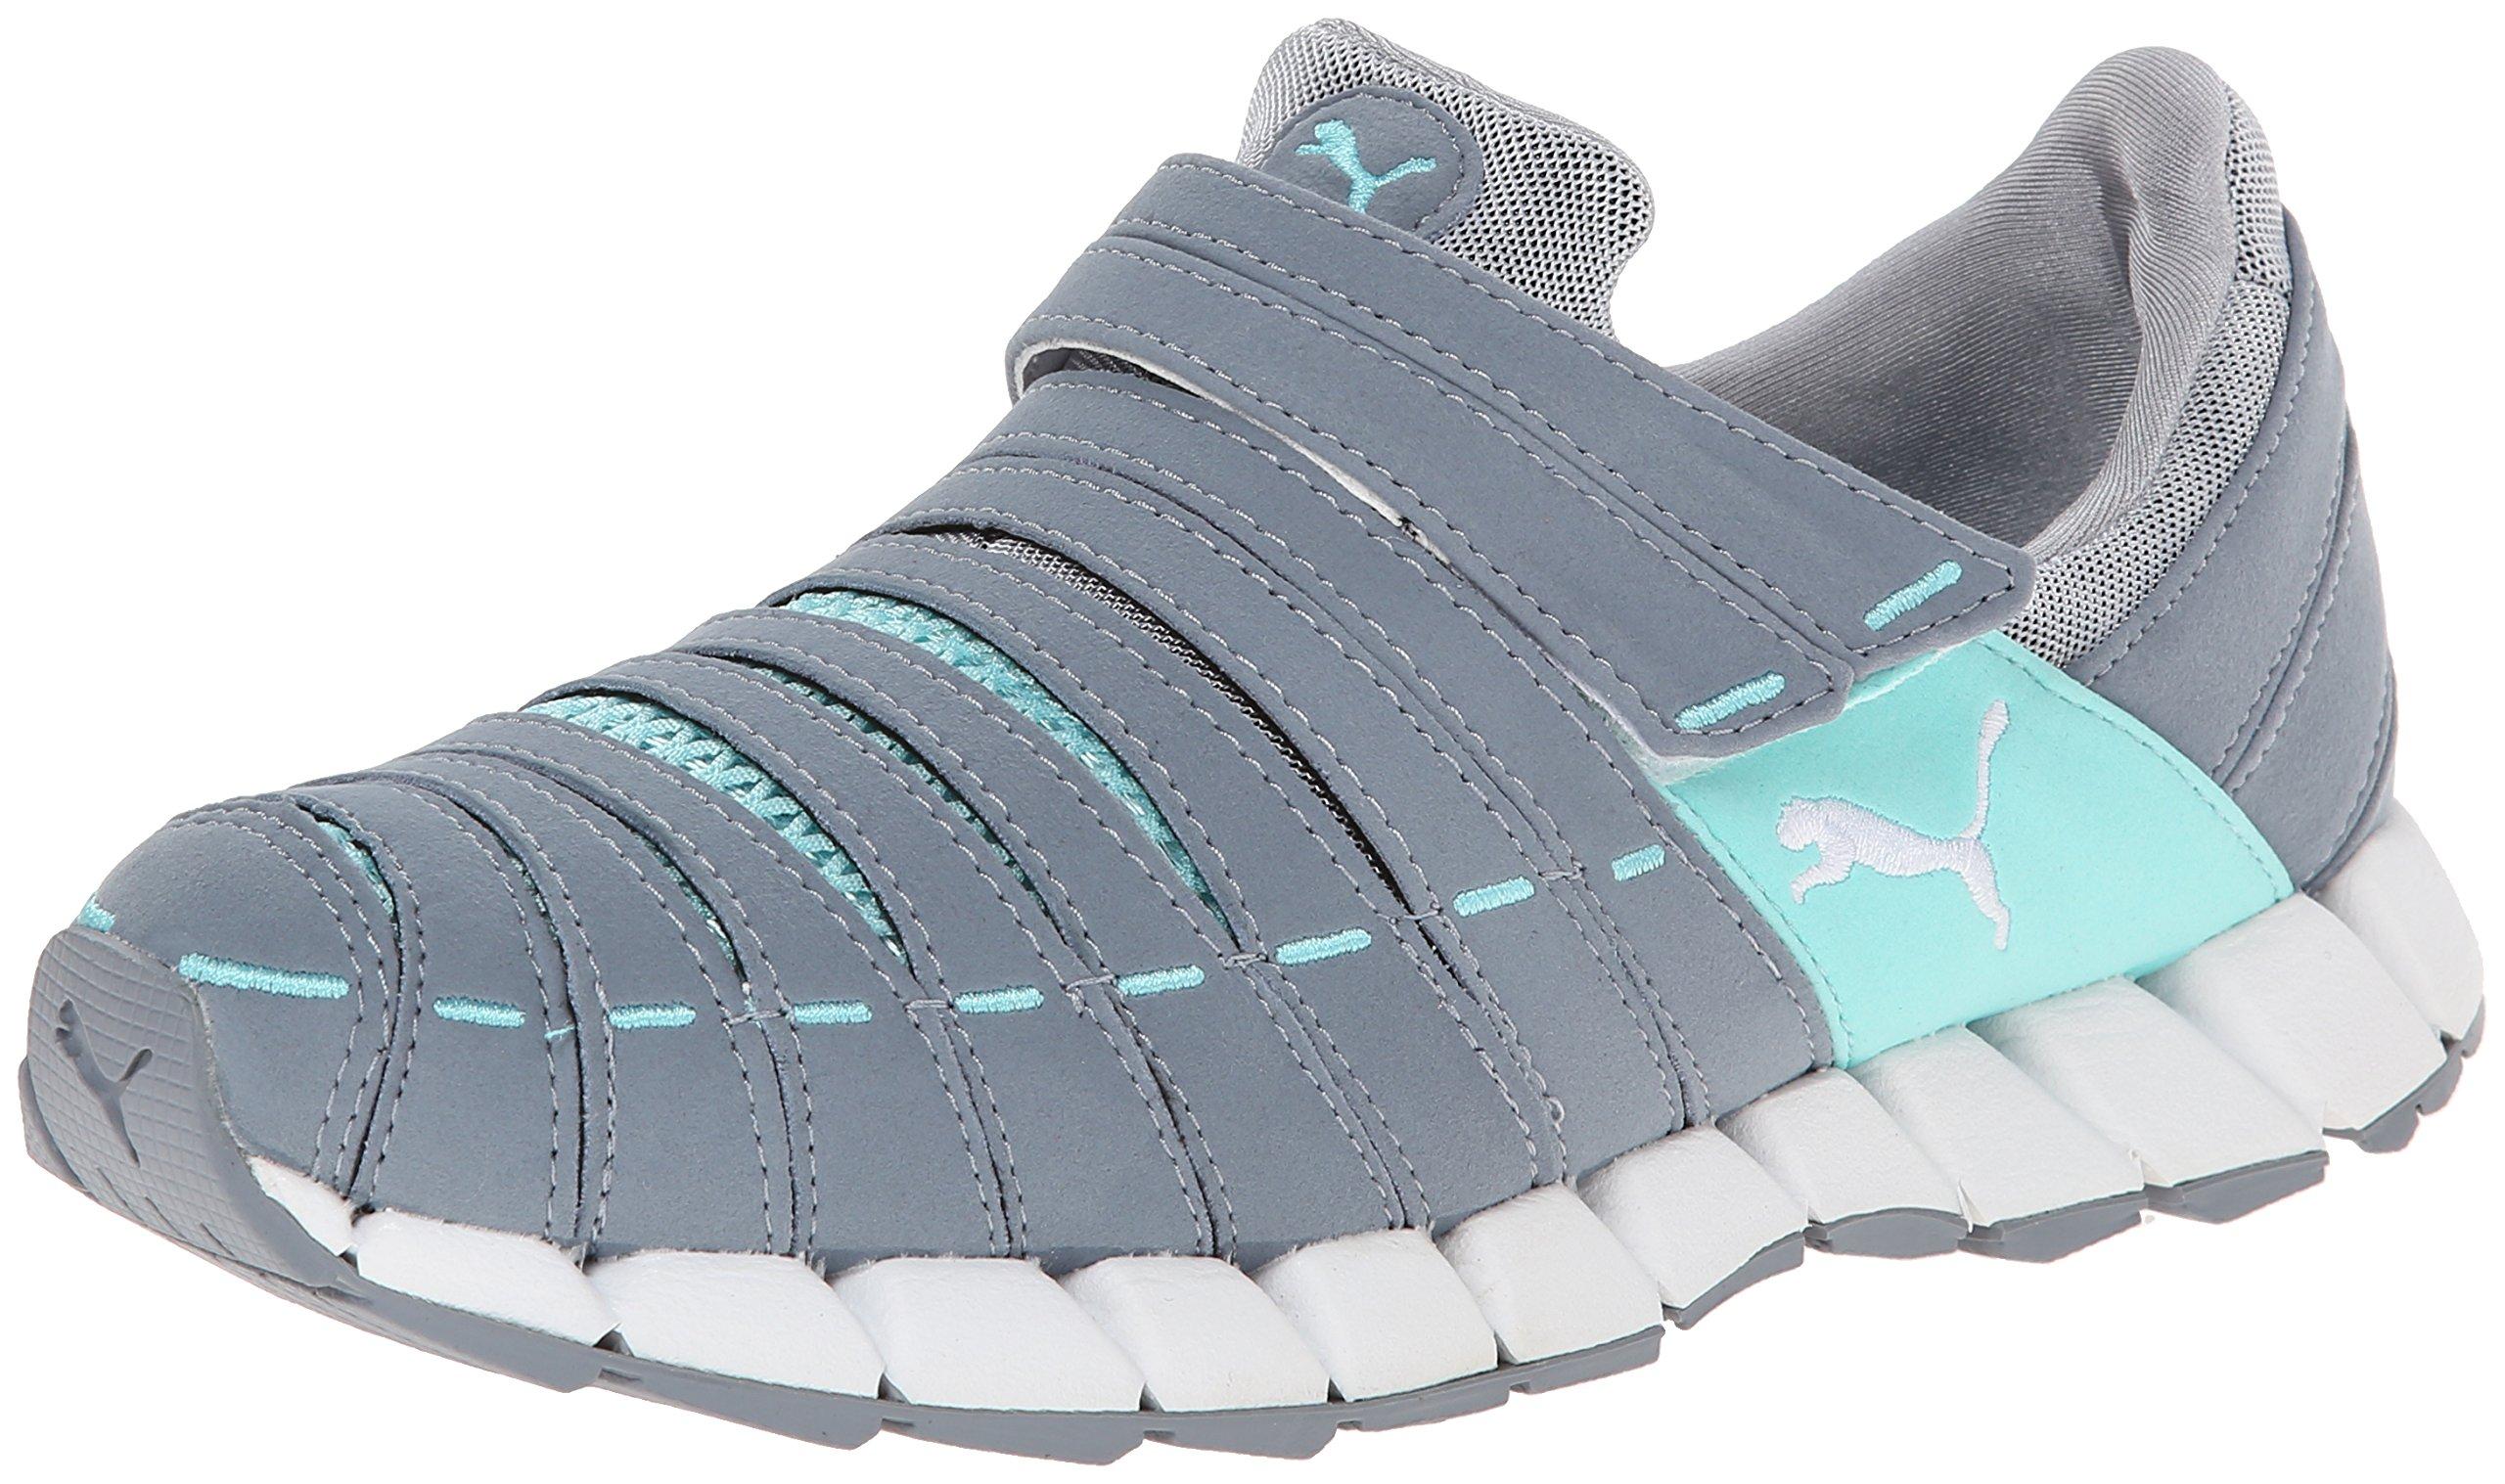 PUMA Women's Osu Running Shoe,Tradewinds/Aruba Blue,10 B US